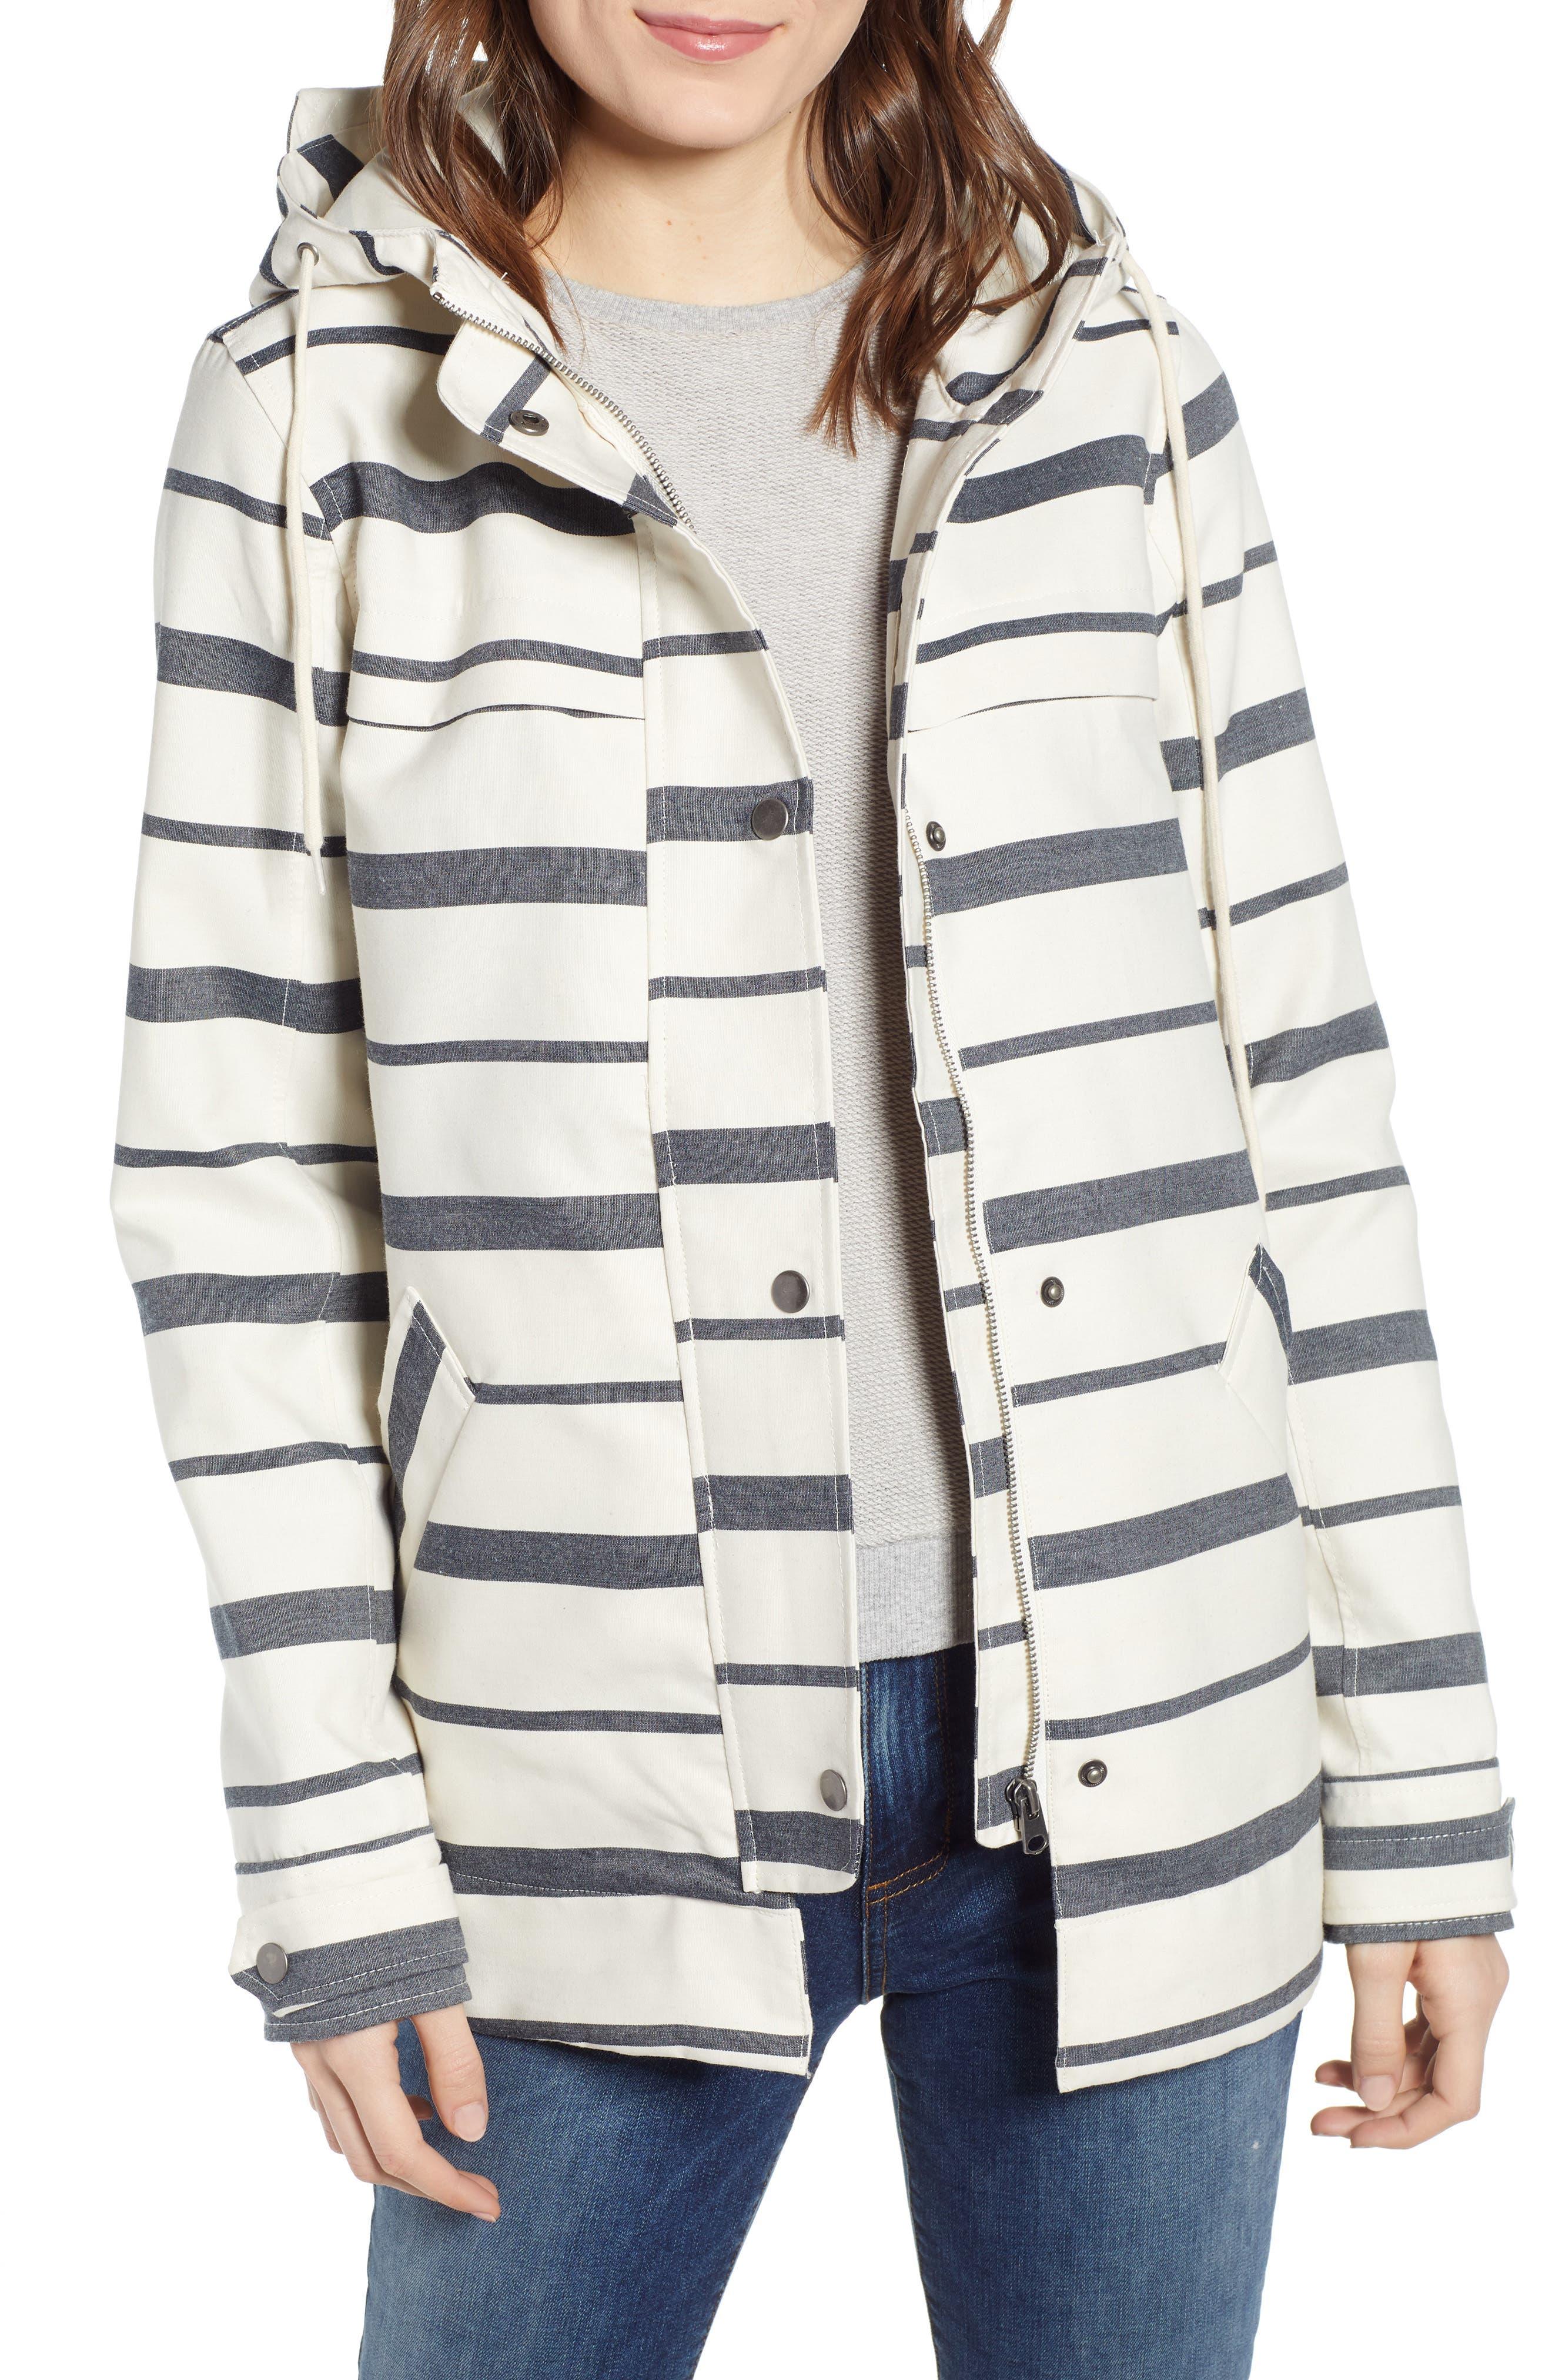 THREAD & SUPPLY, Portside Rain Jacket, Main thumbnail 1, color, BLACK WHITE STRIPE